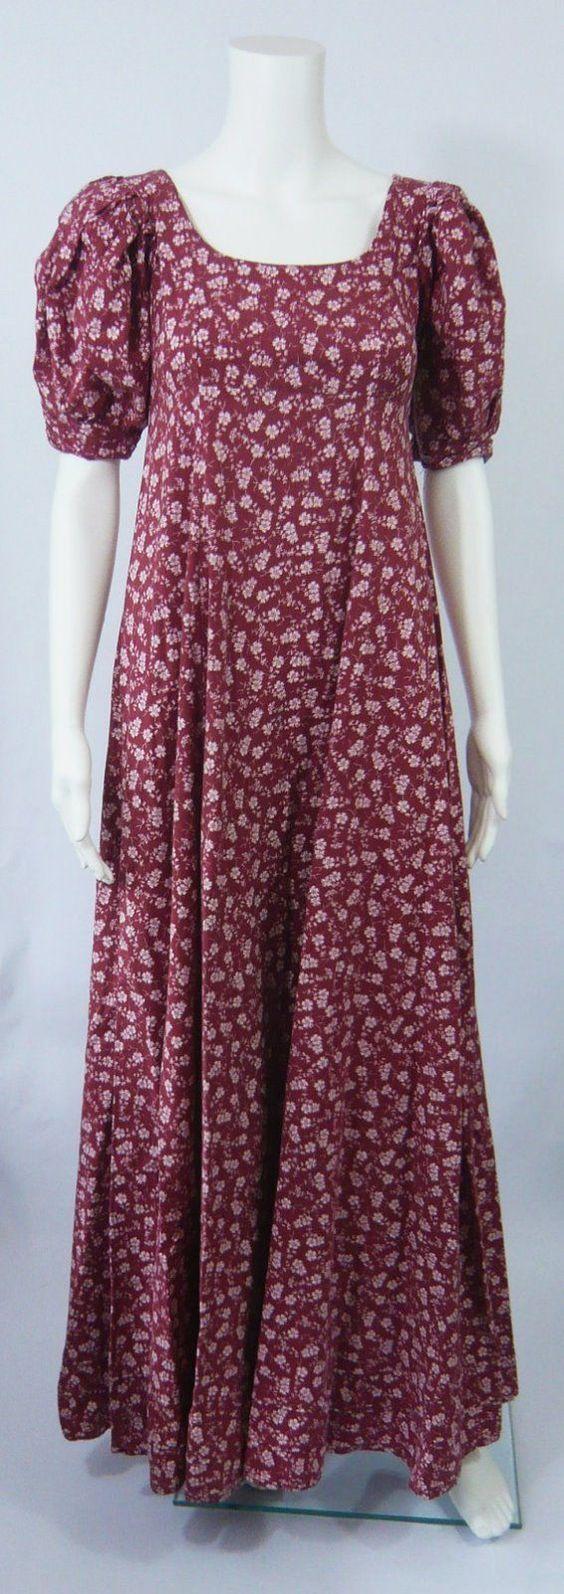 @isabellegeneva Laura Ashley vintage Regency style Dress - Lost in Jane Austen??? | eBay